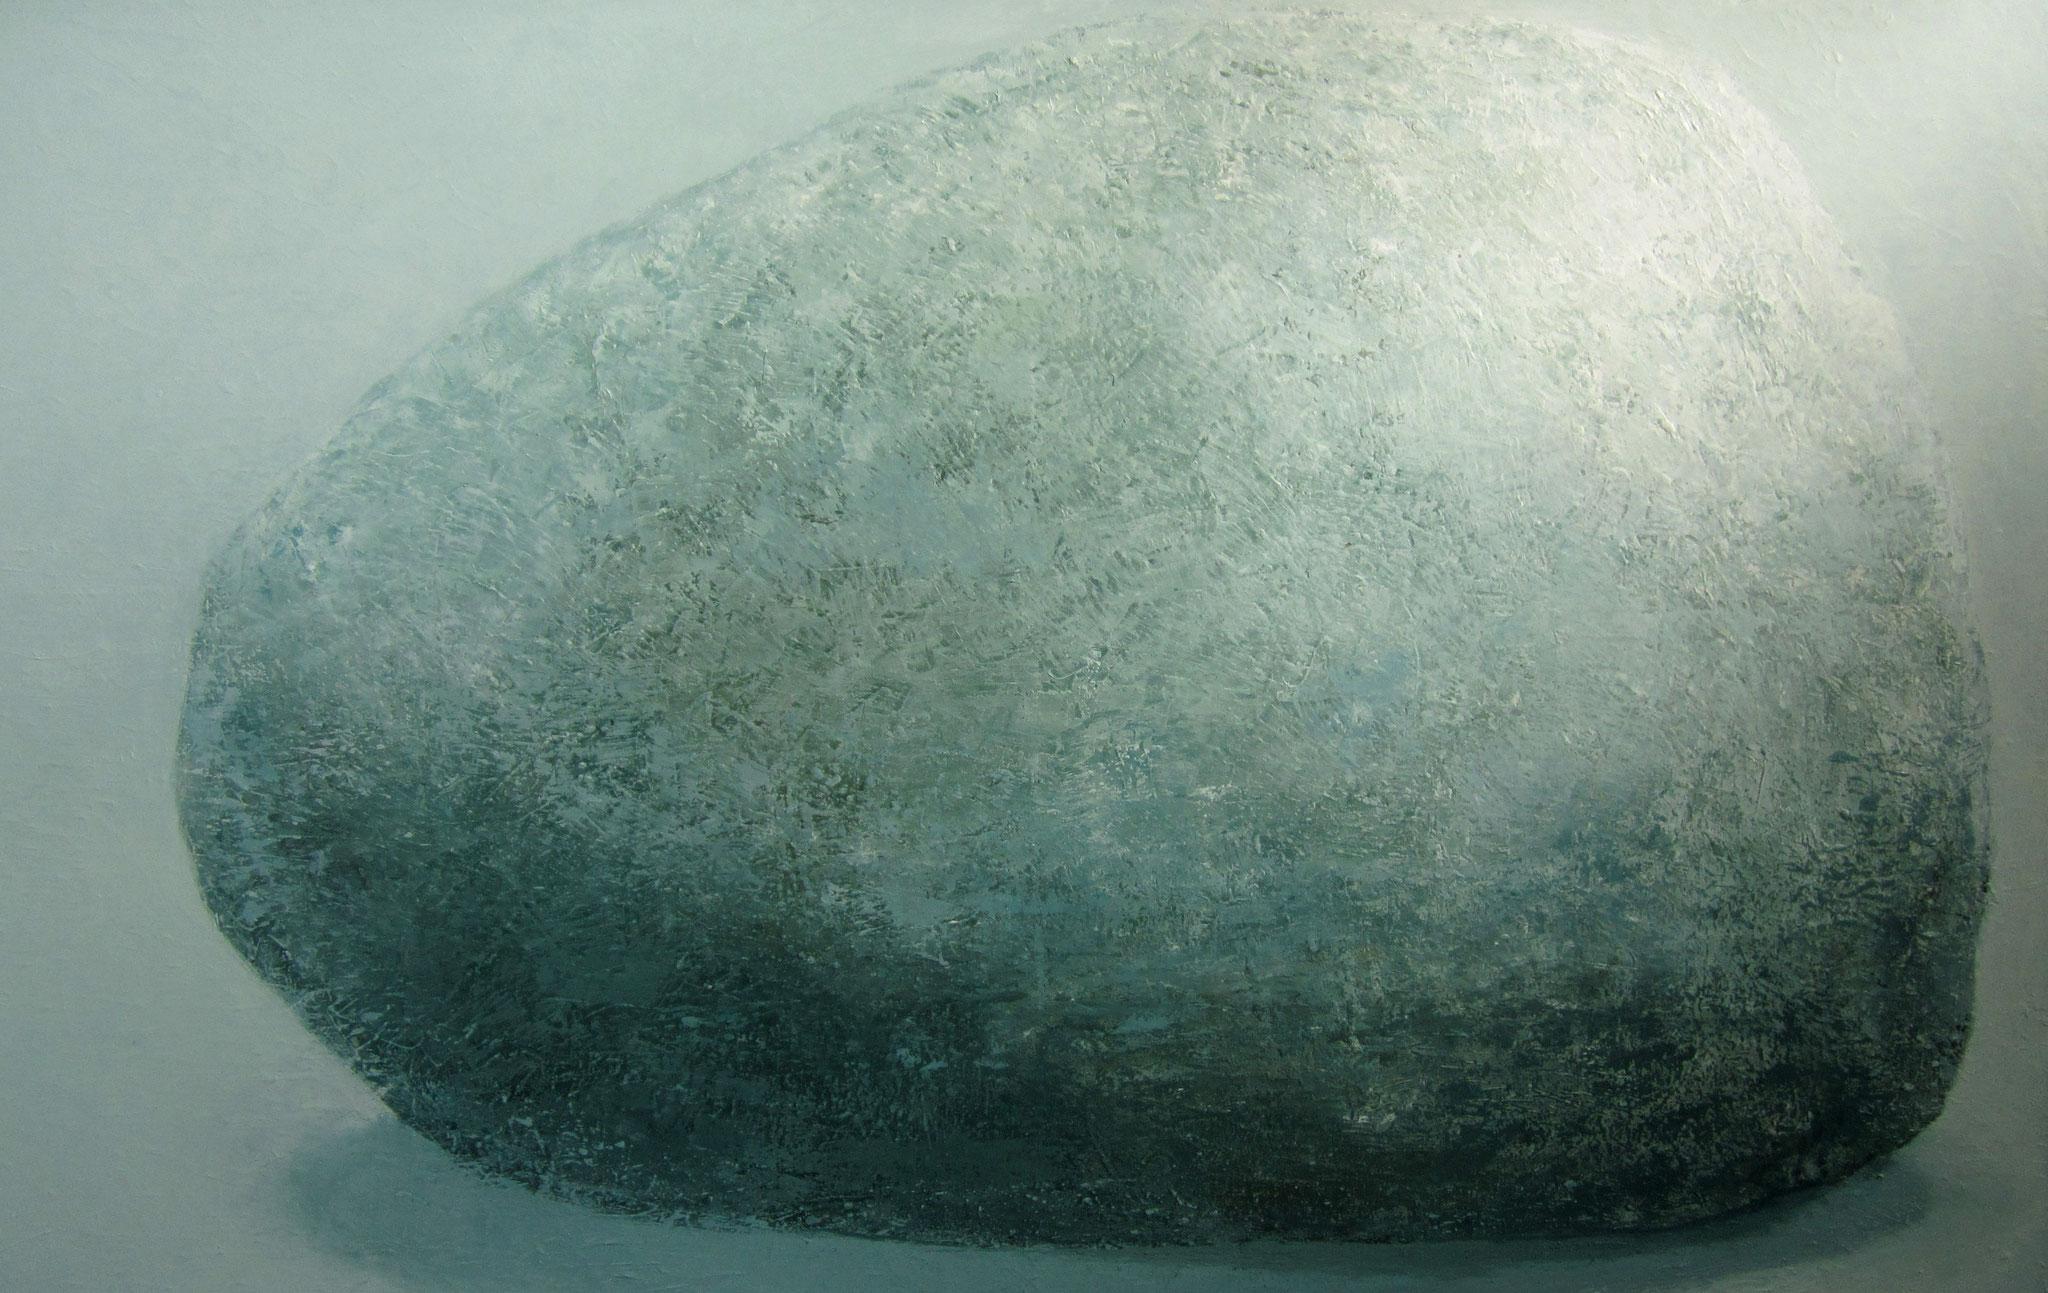 Blauwe kei - 2020 - 100 x 160cm - oil on canvas